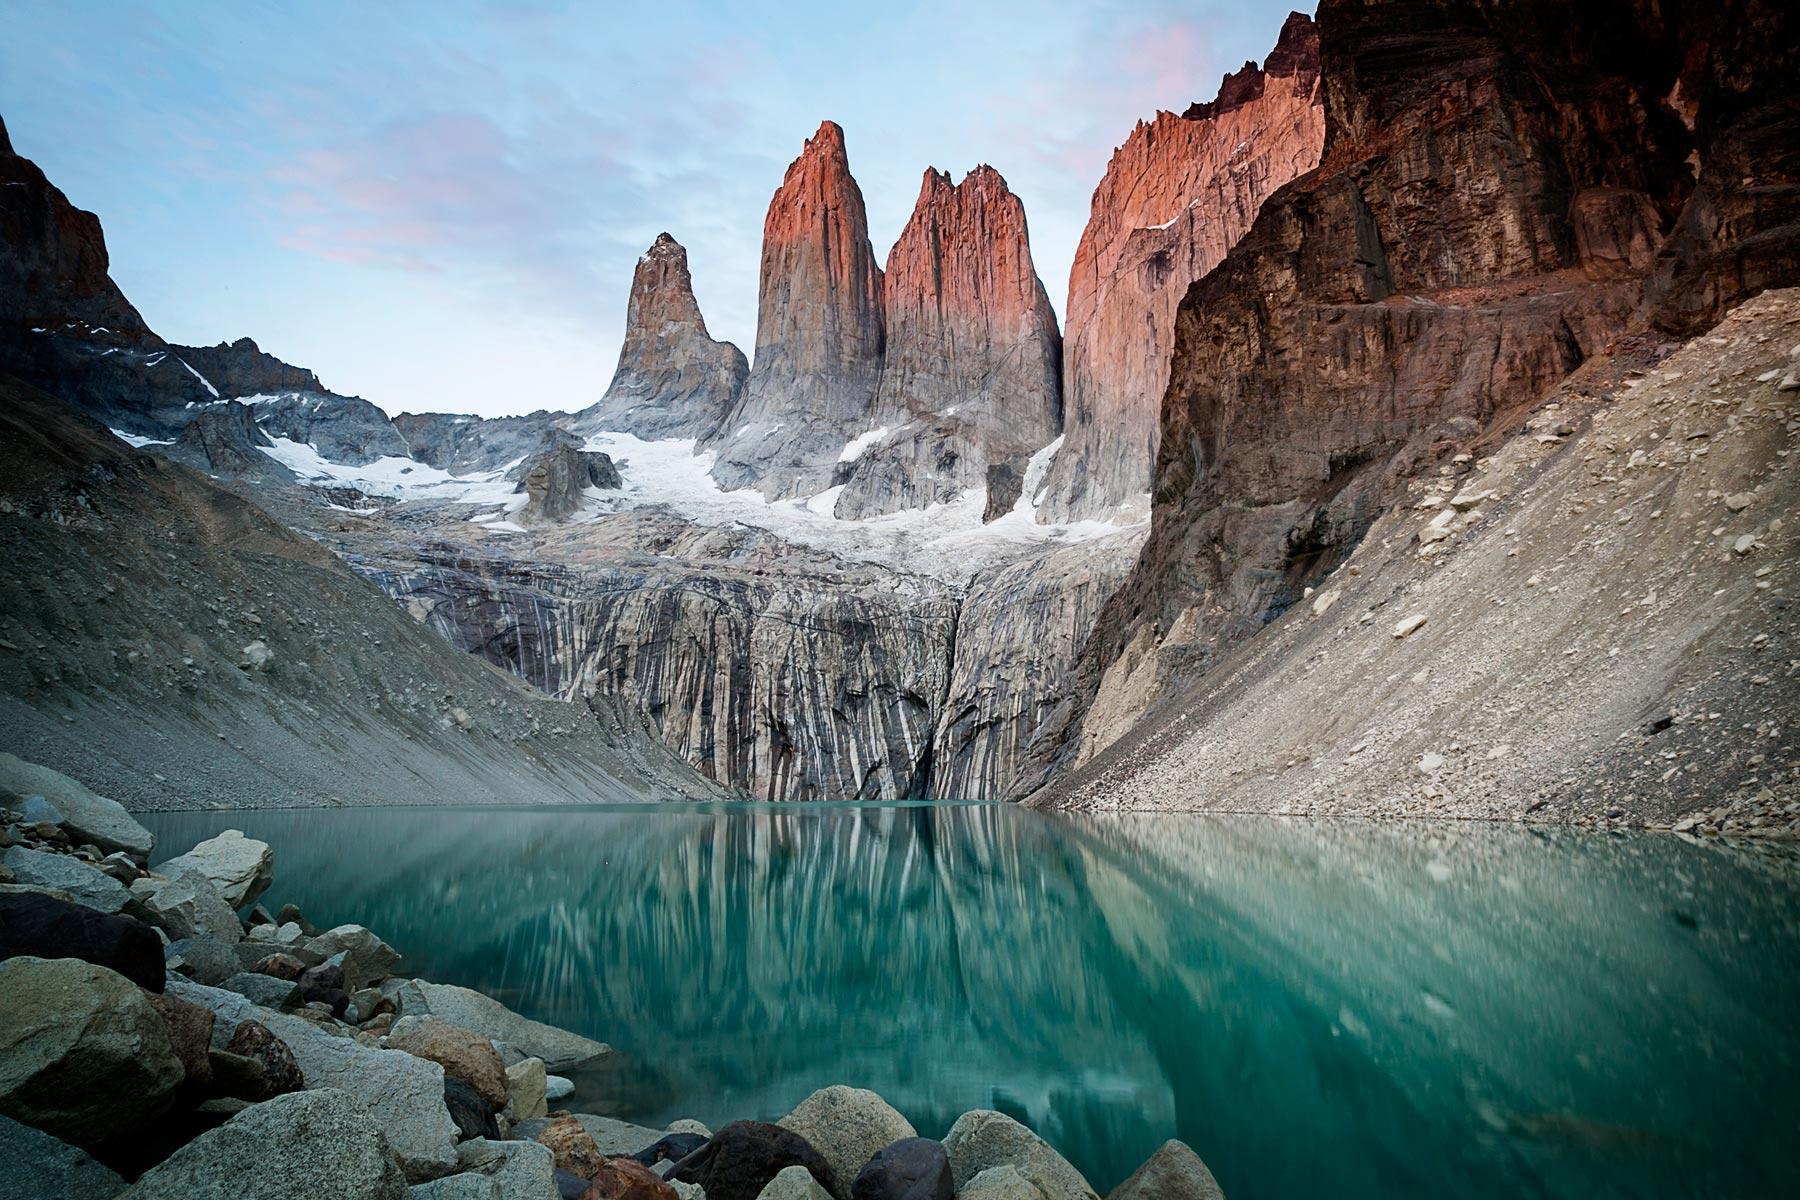 01-torres-del-paine-circuit-trek-day-9-hiking-up-to-las-torres